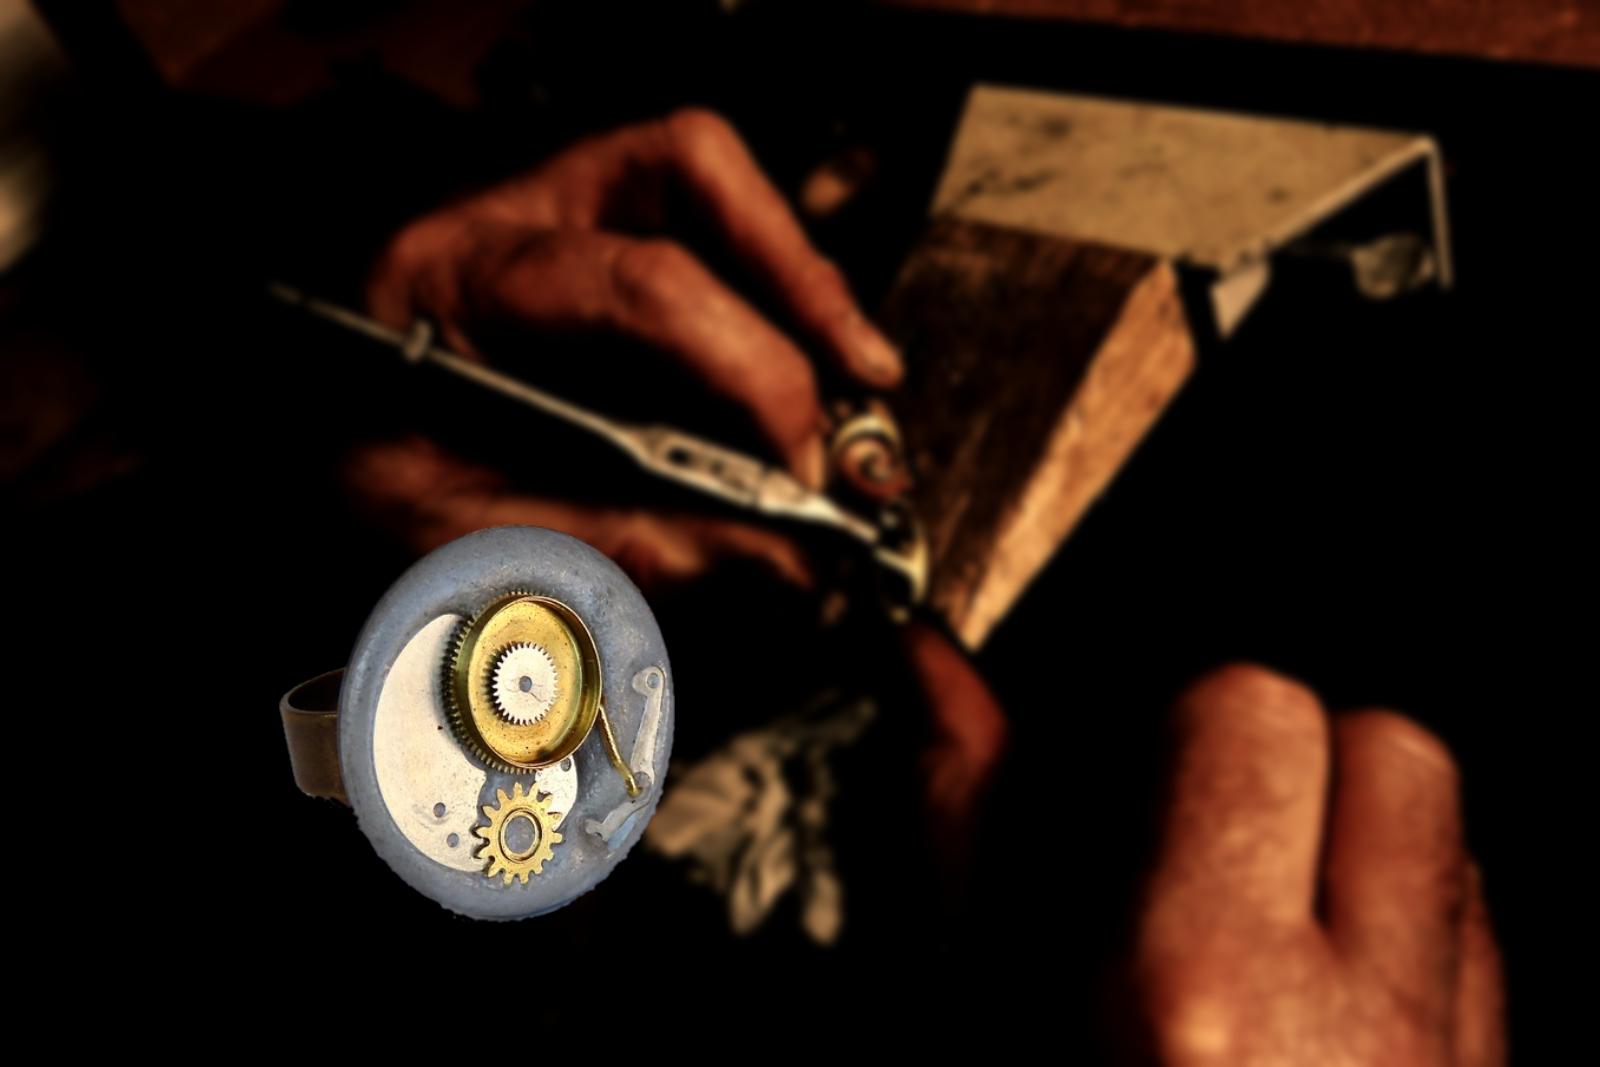 fabrication-bijoux-artisanaux-bague-stea